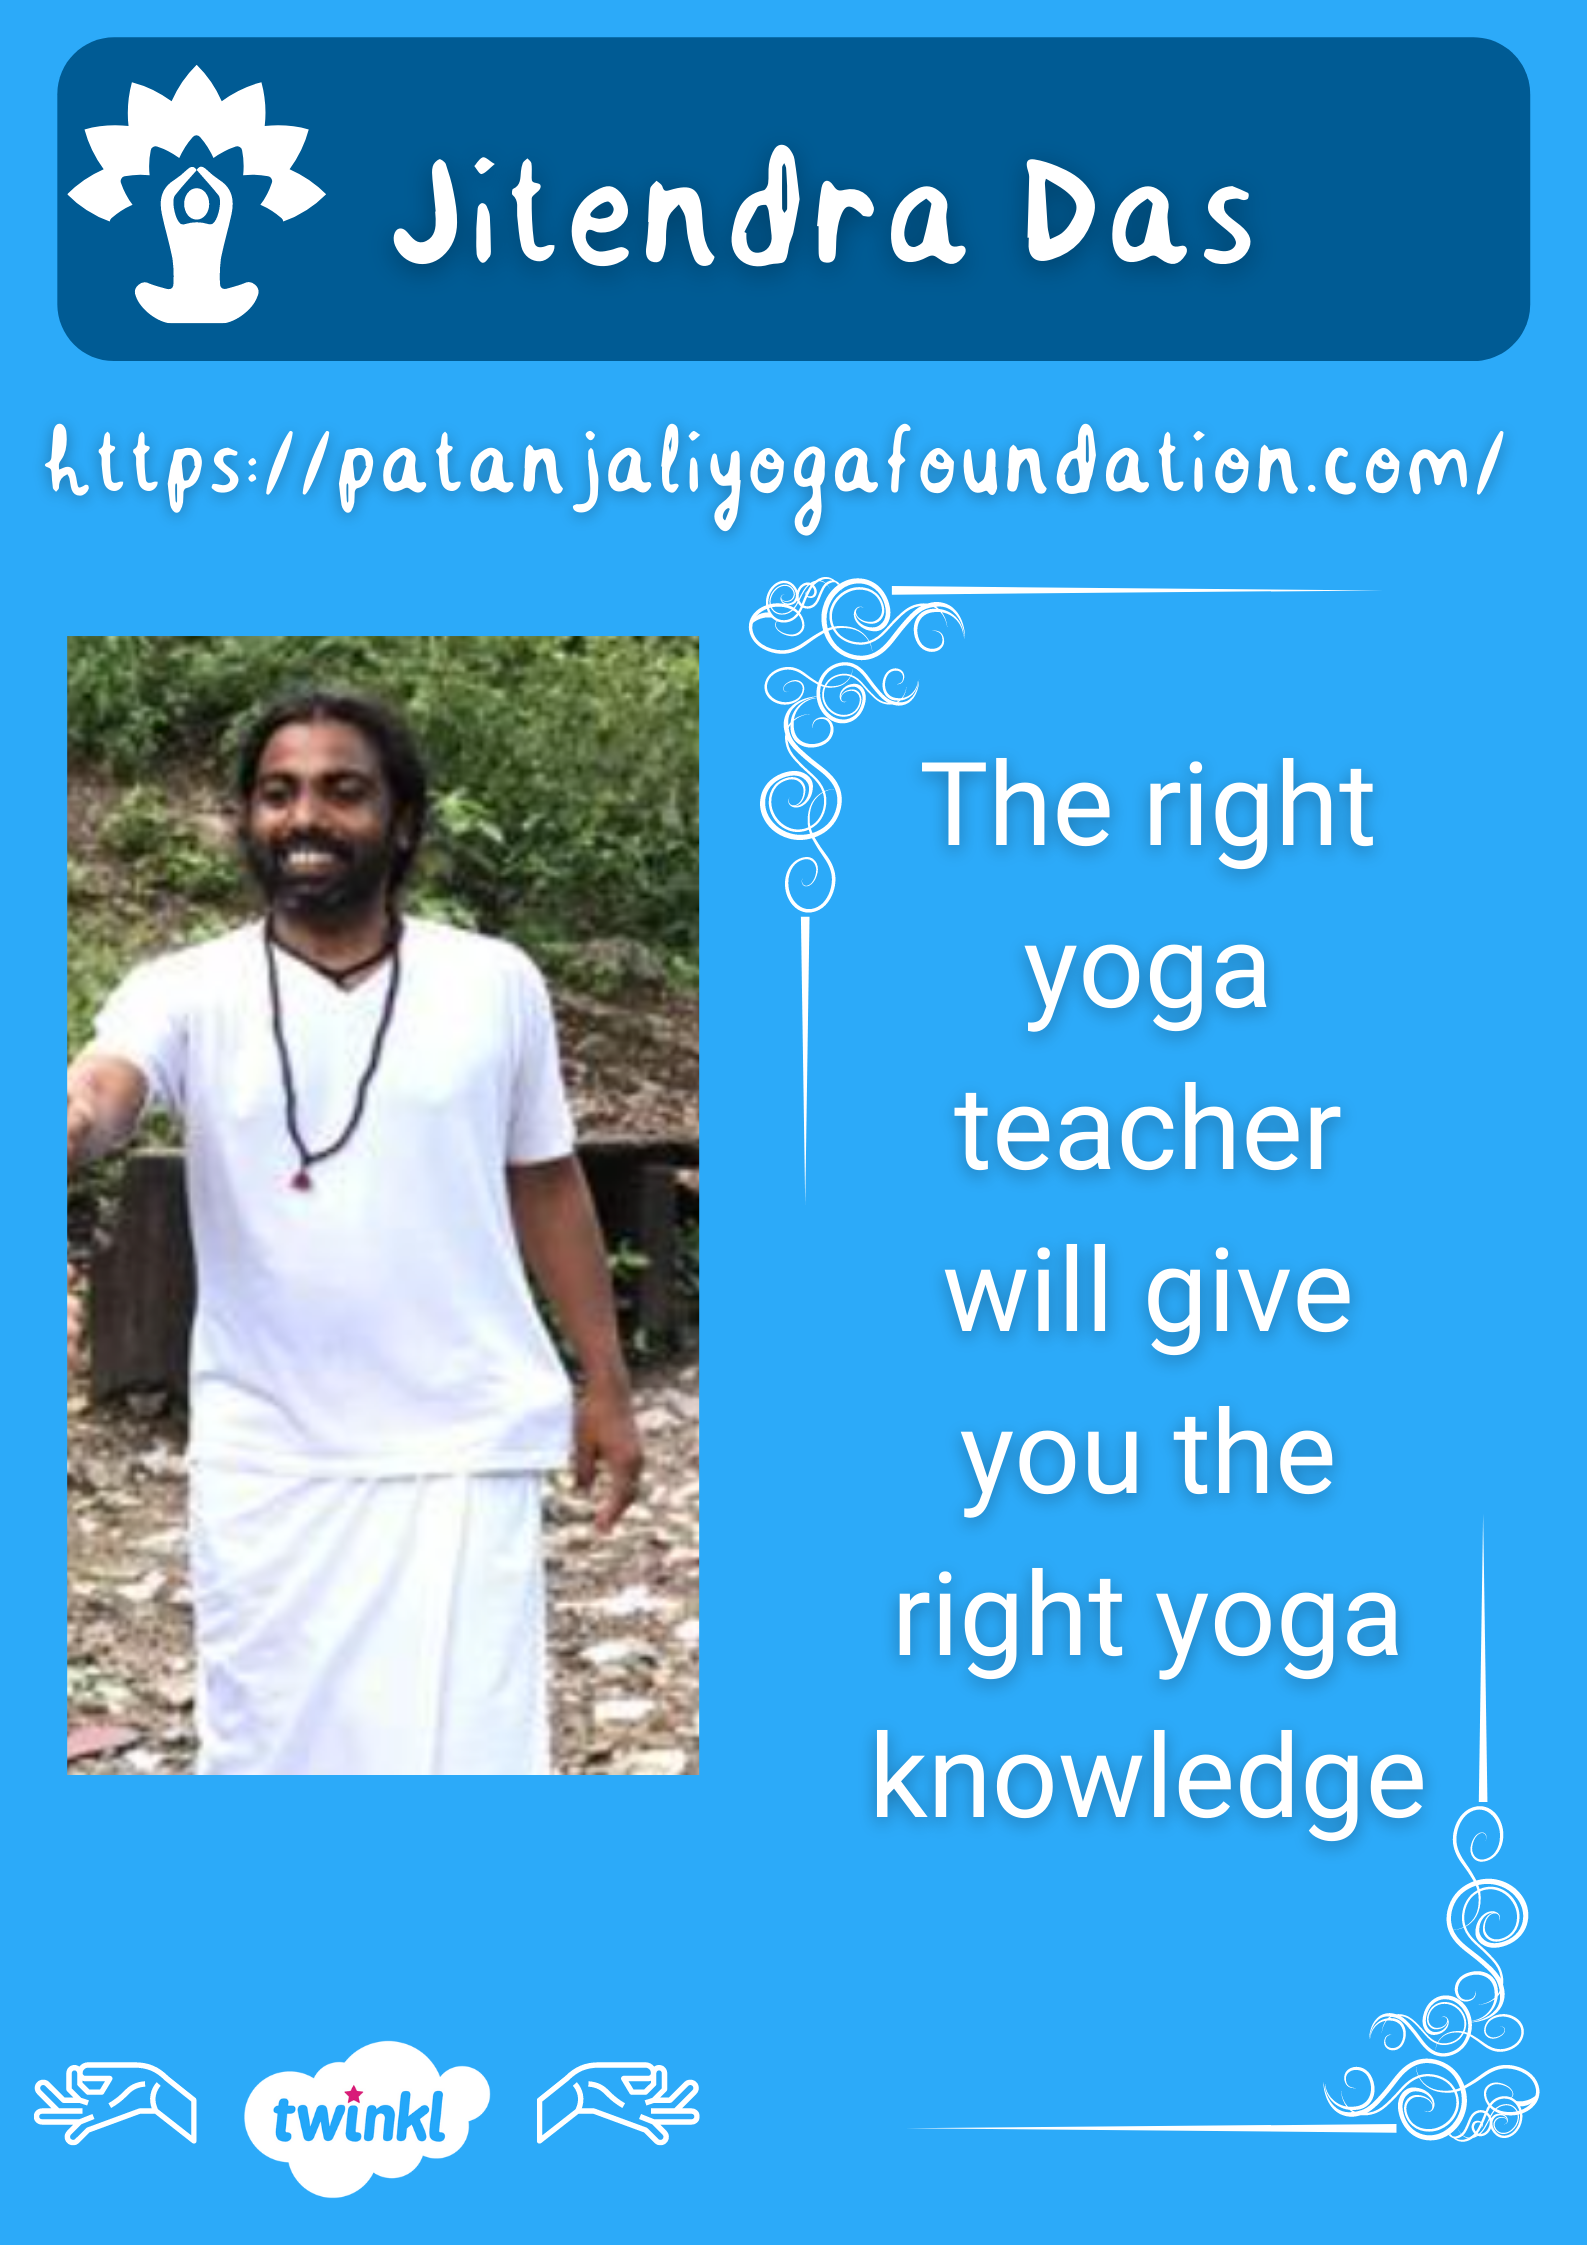 Jitendra Das Patanjali yoga foundation